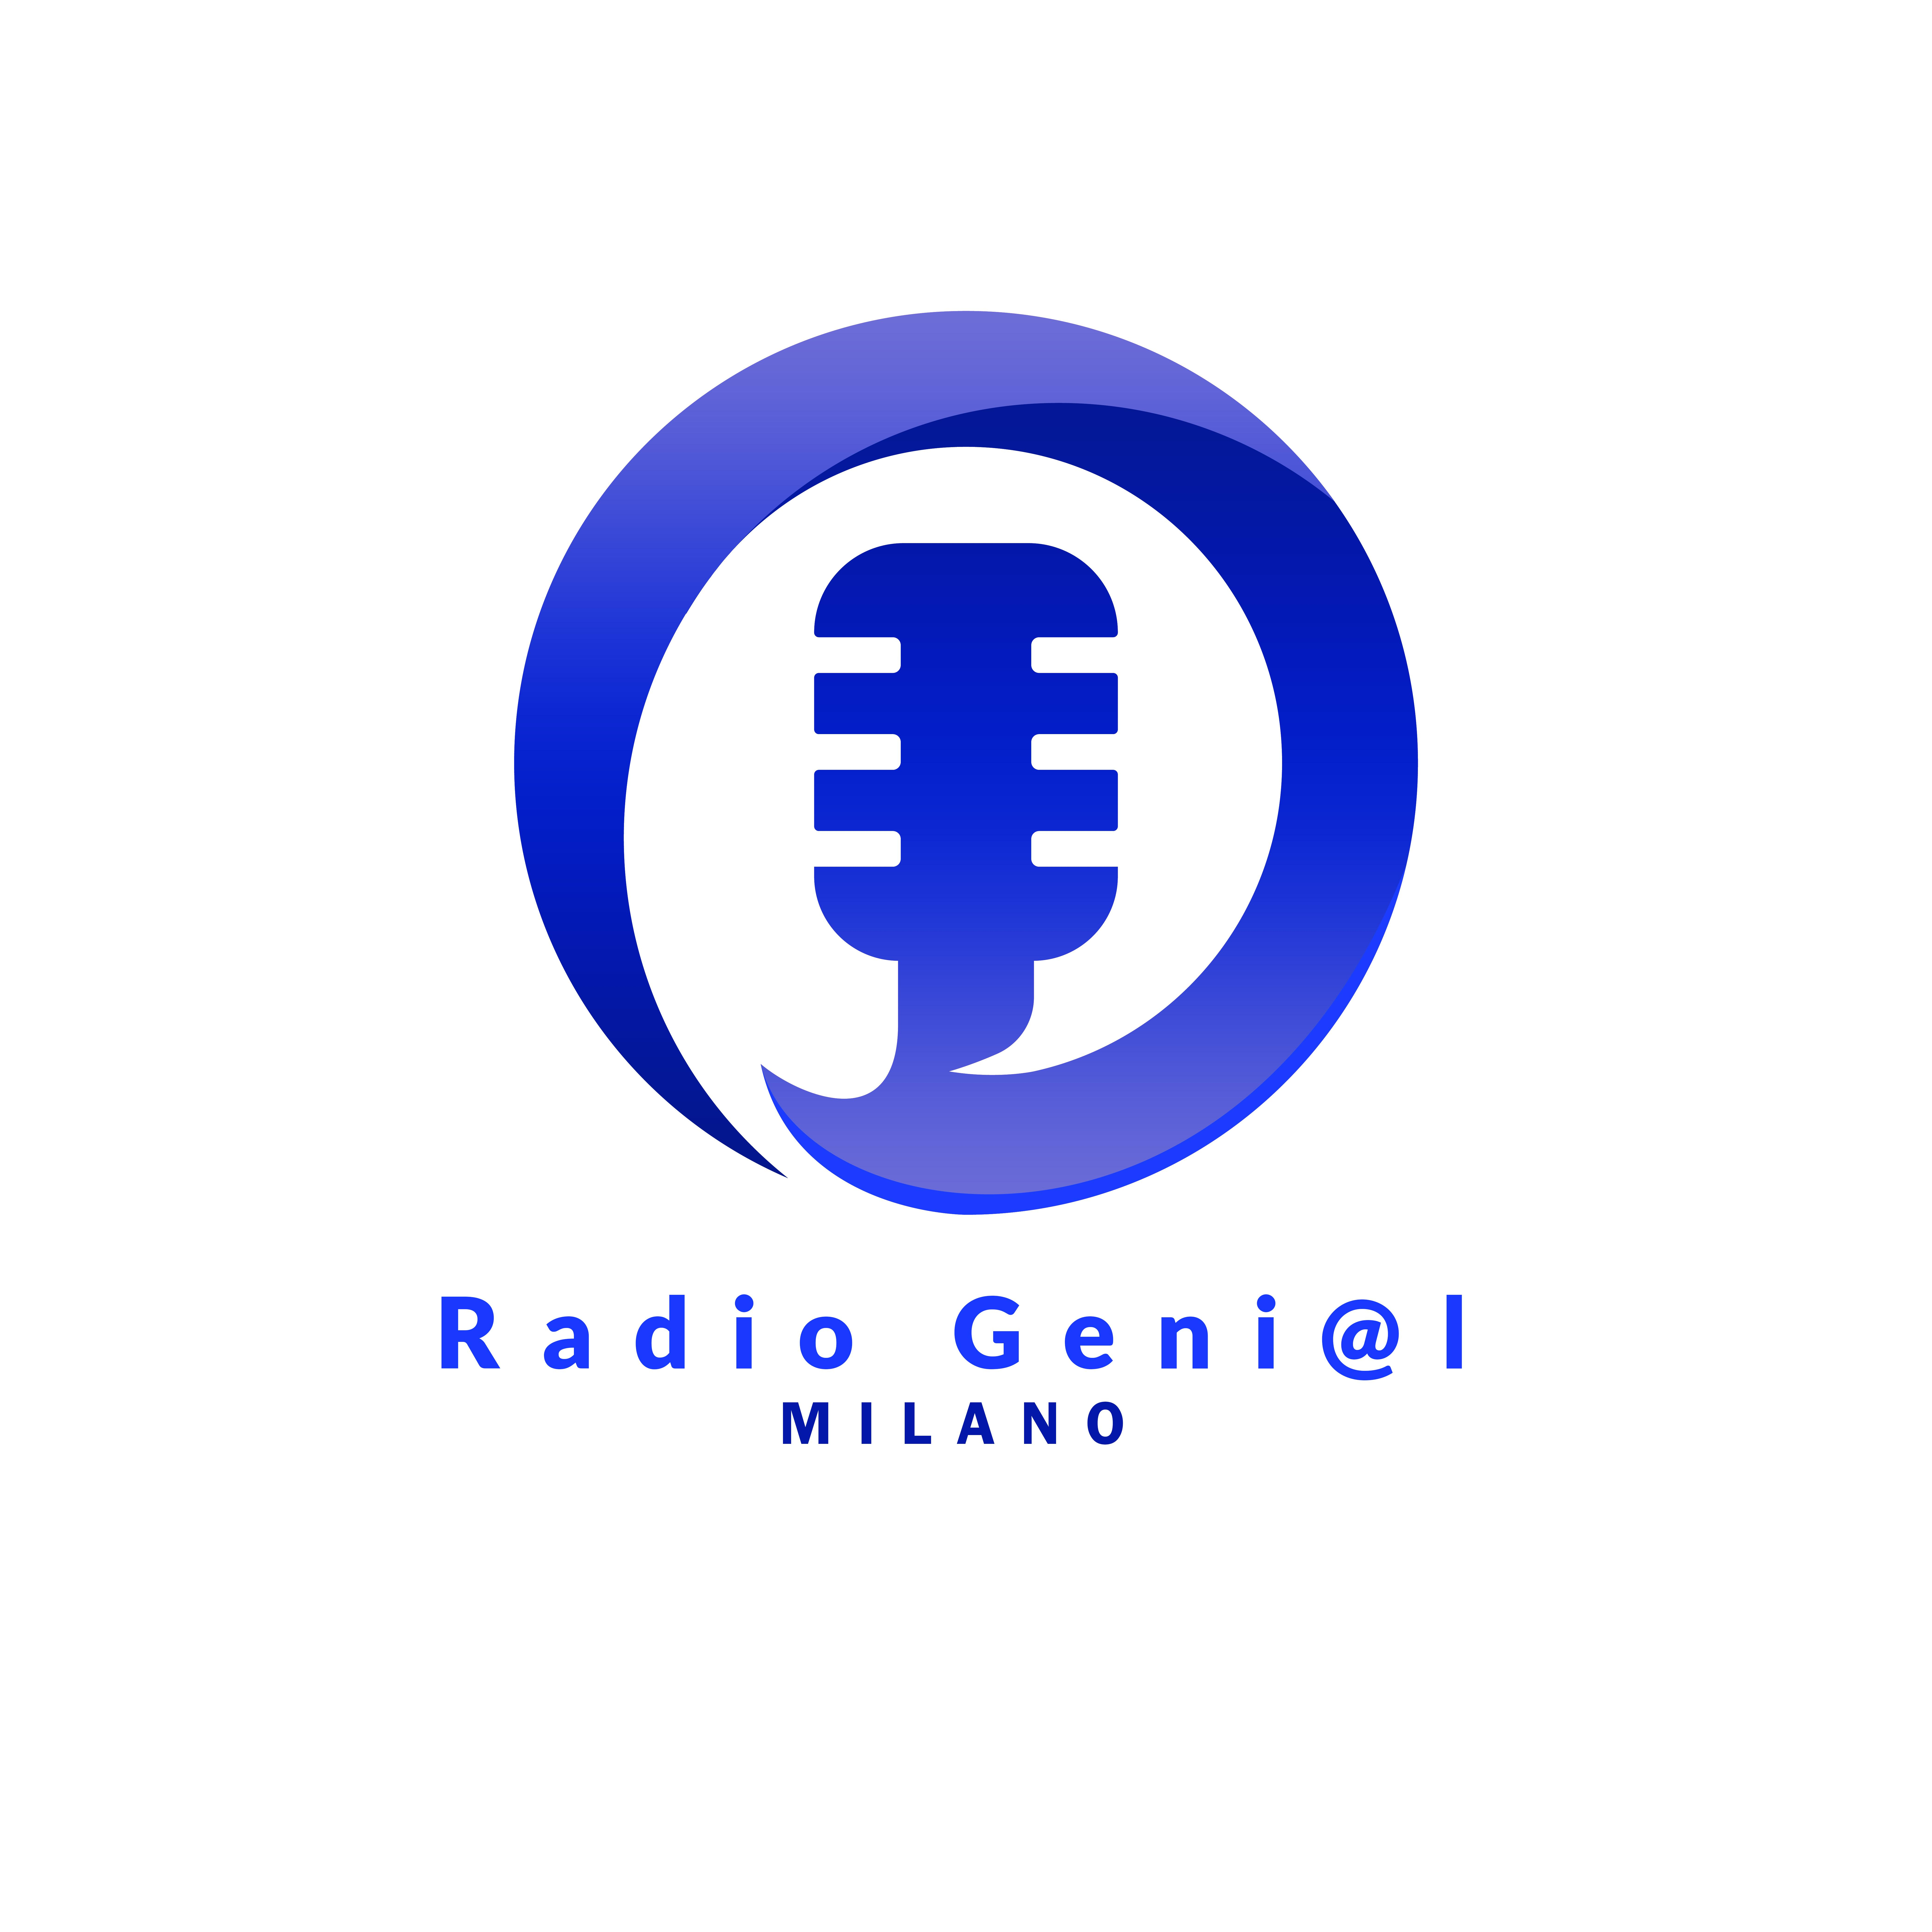 Radio Genial Milano